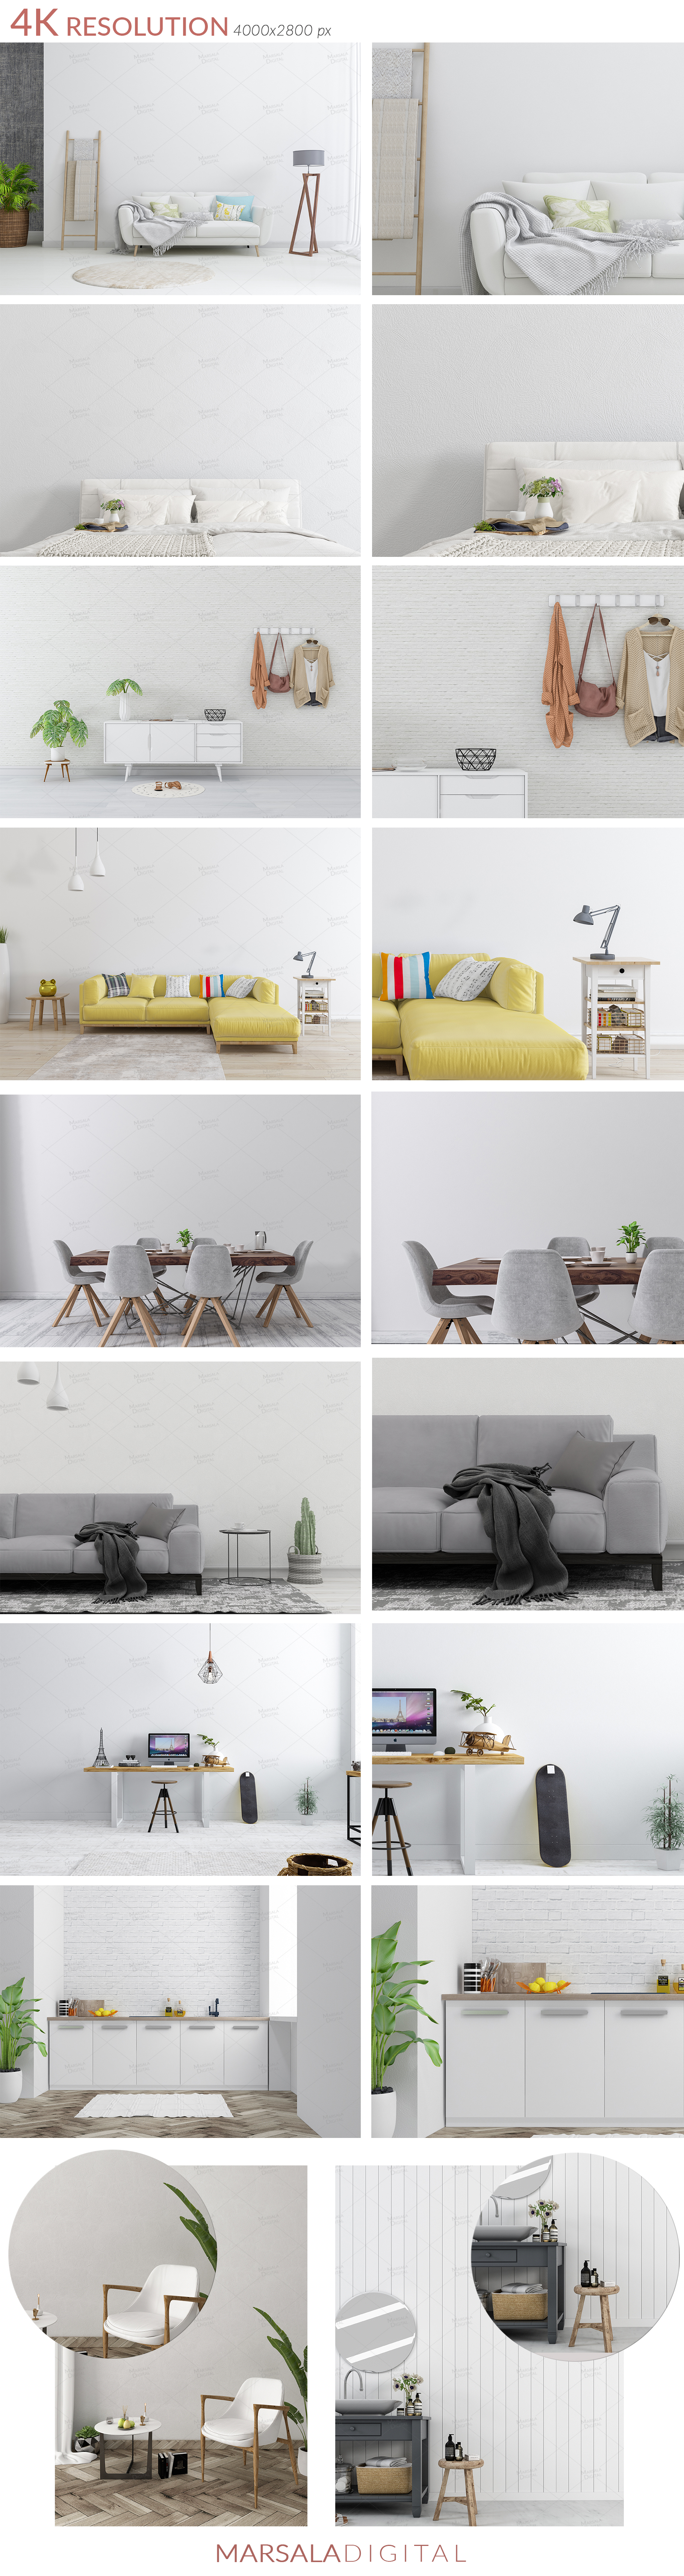 Massive Interior Wall Mockup, Frame Mockup Bundle FREE sampl example image 5